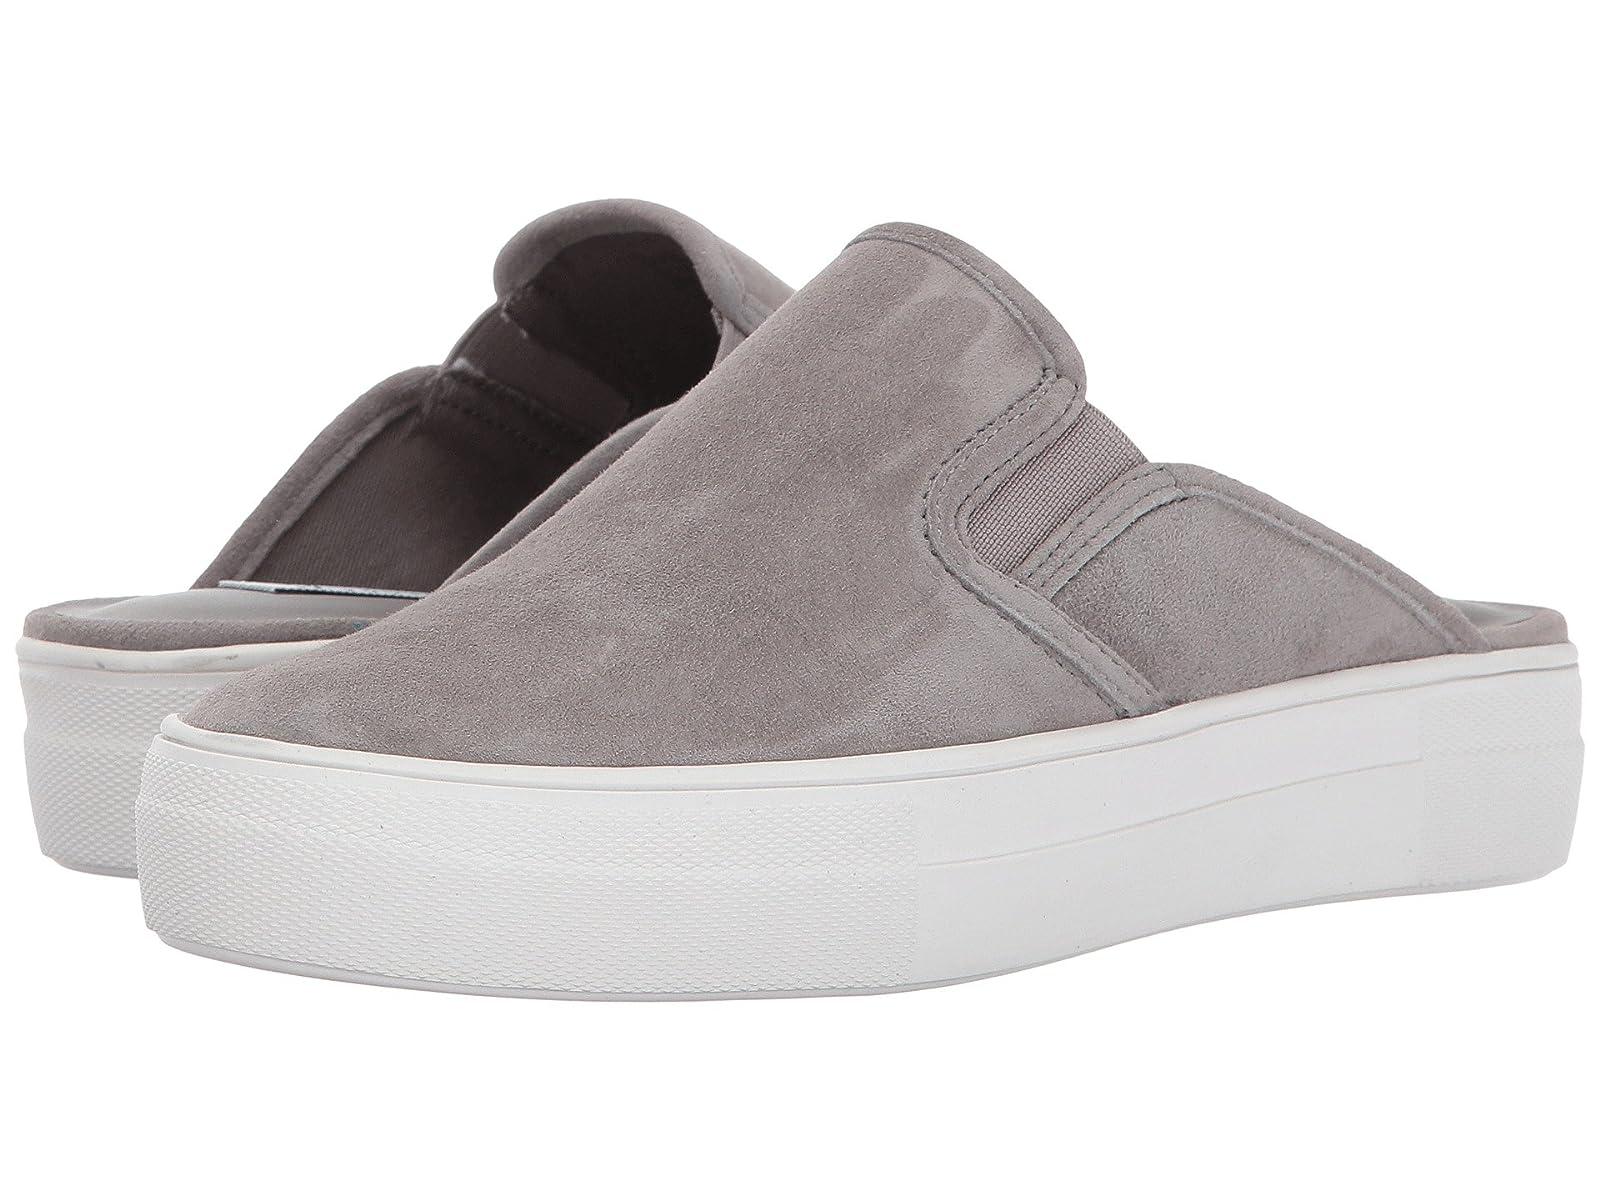 Steve Madden GlendaCheap and distinctive eye-catching shoes